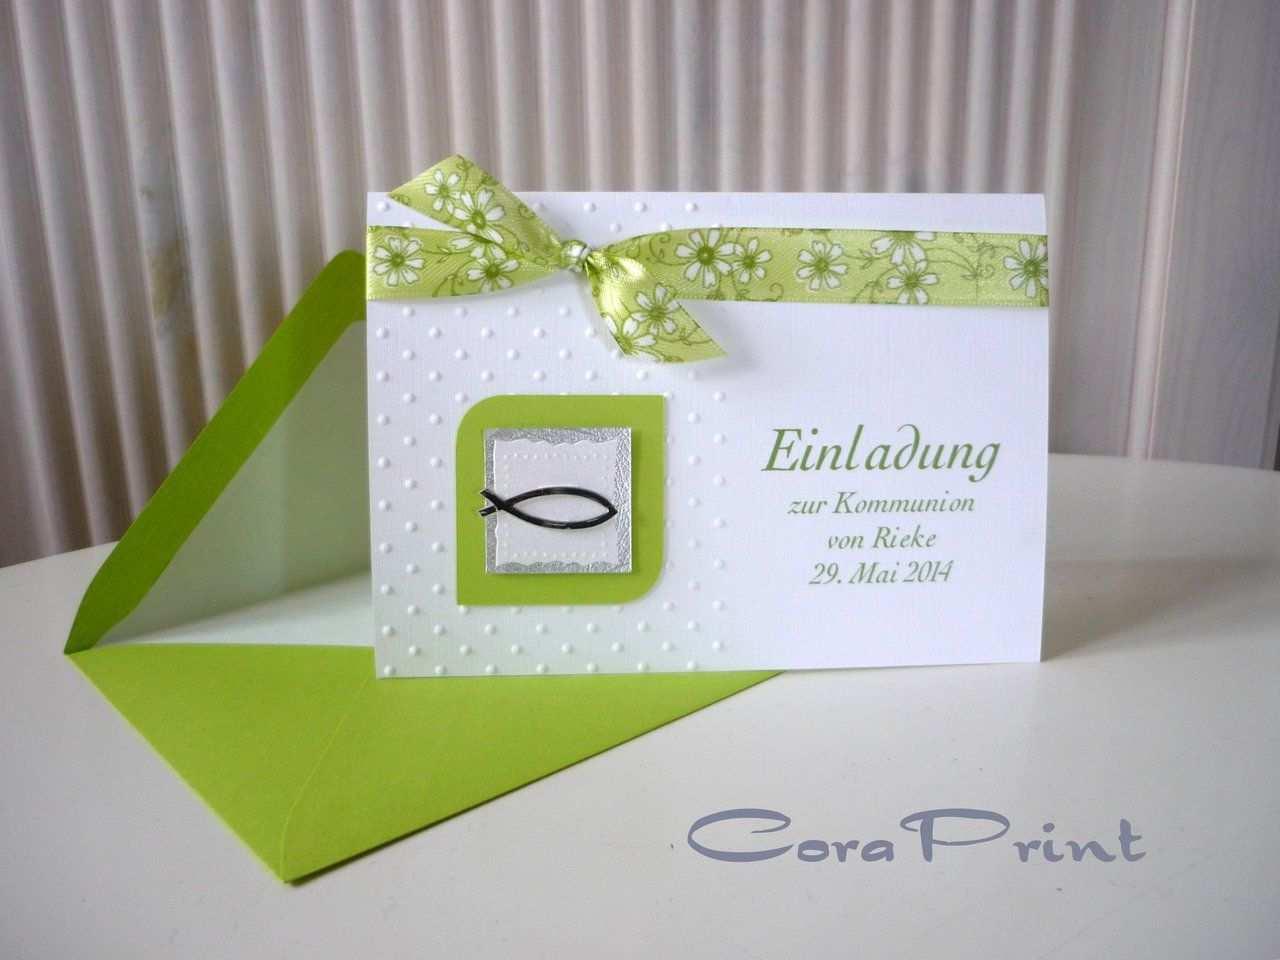 Kommunion Einladung Kommunion Einladungen Einladungskarten